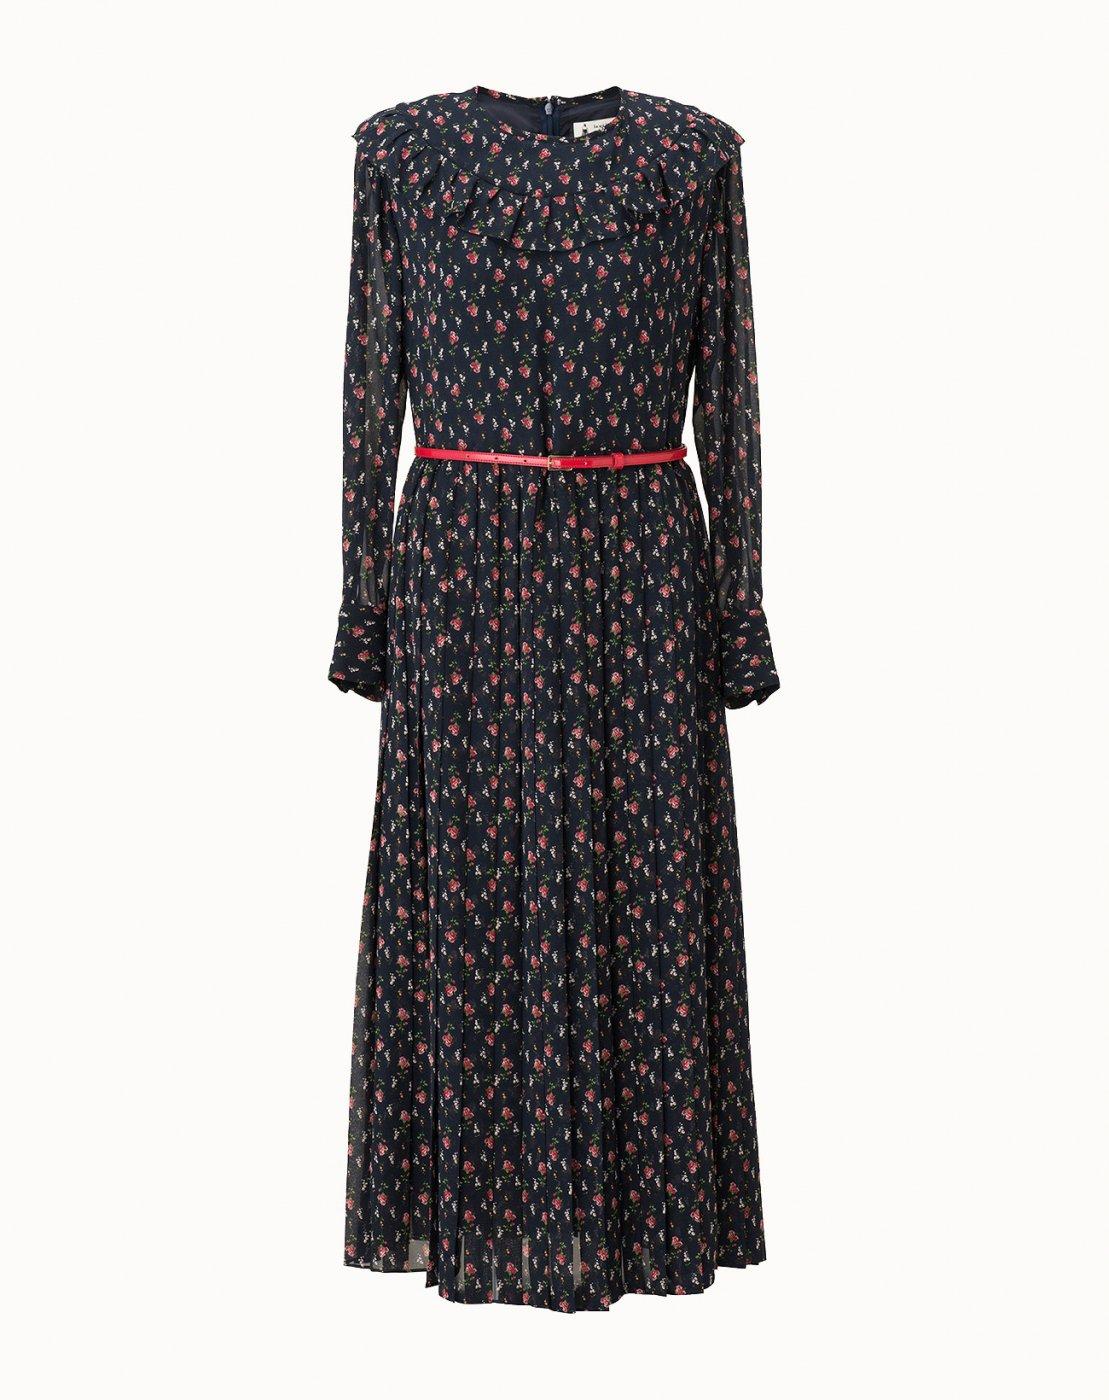 leur logette - Rose Line Printed Dress - Navy